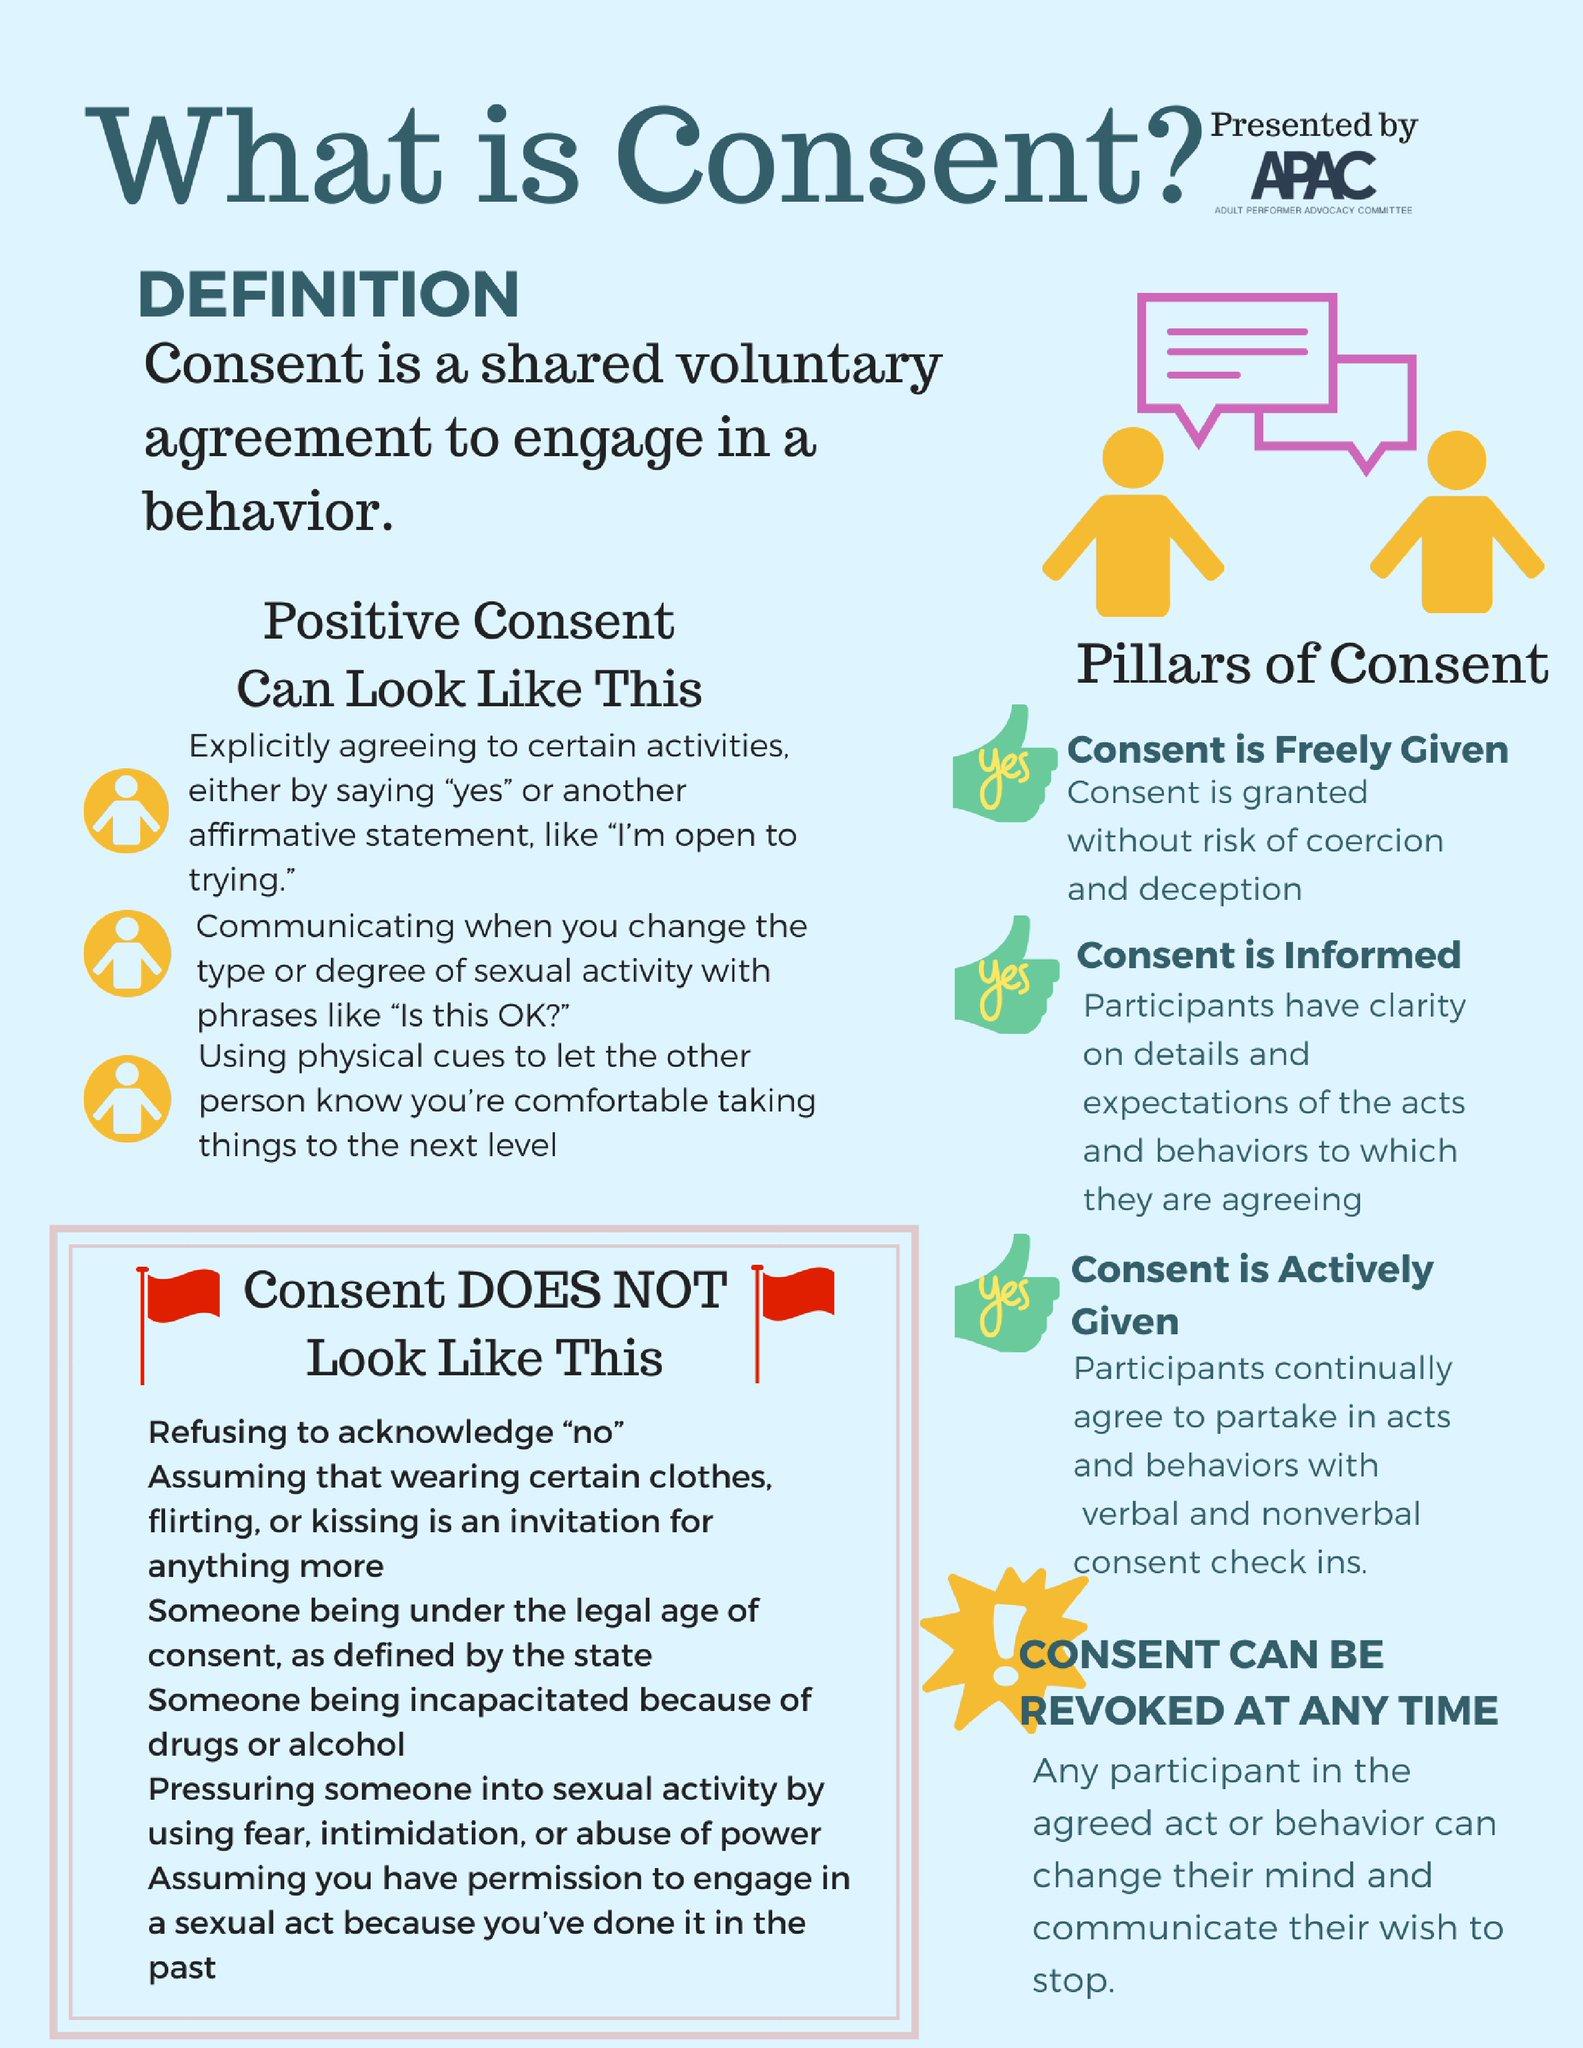 APAC Checklist